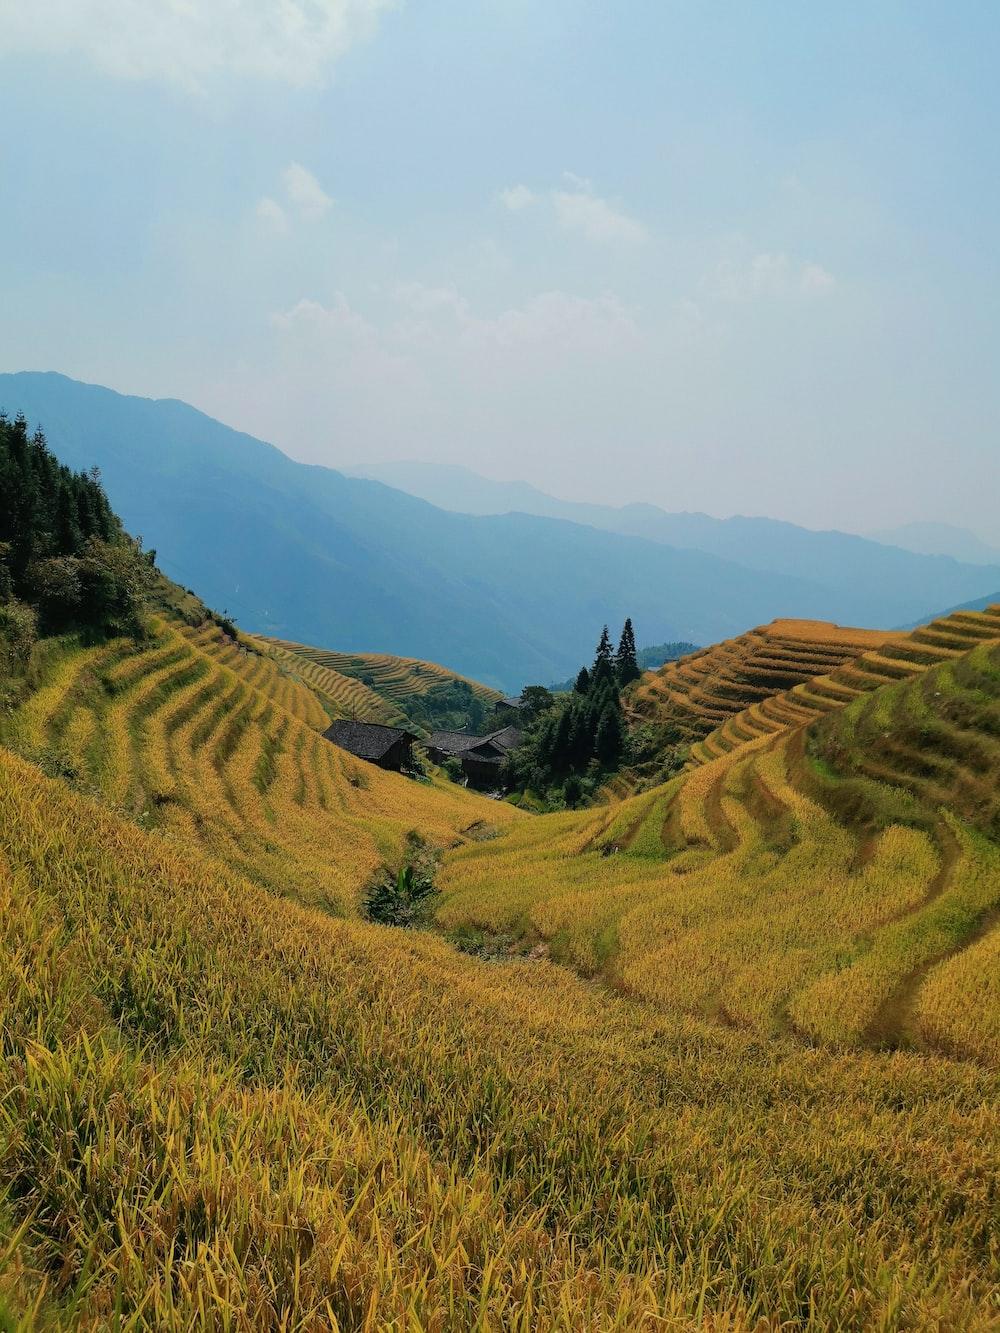 rice terraces under blue sky